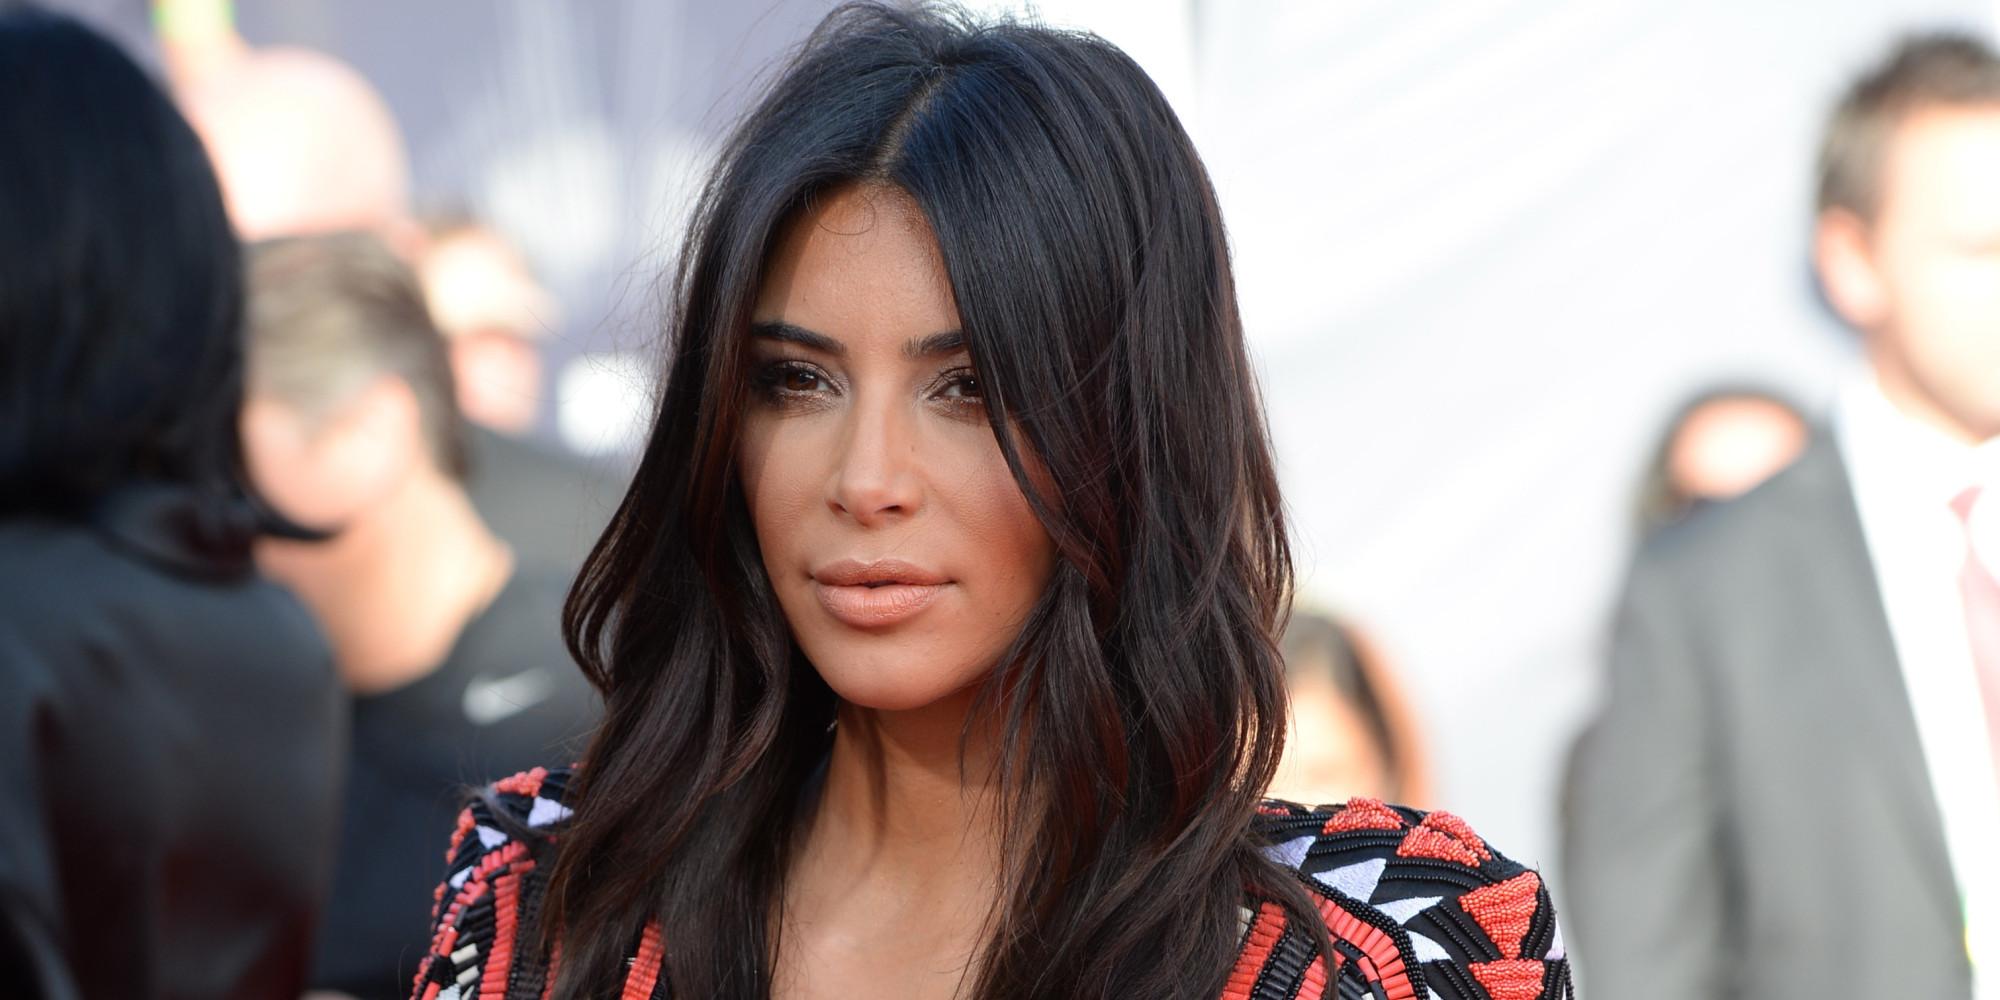 Kim Kardashian Got Her Hair Trimmed, Apparently | HuffPost